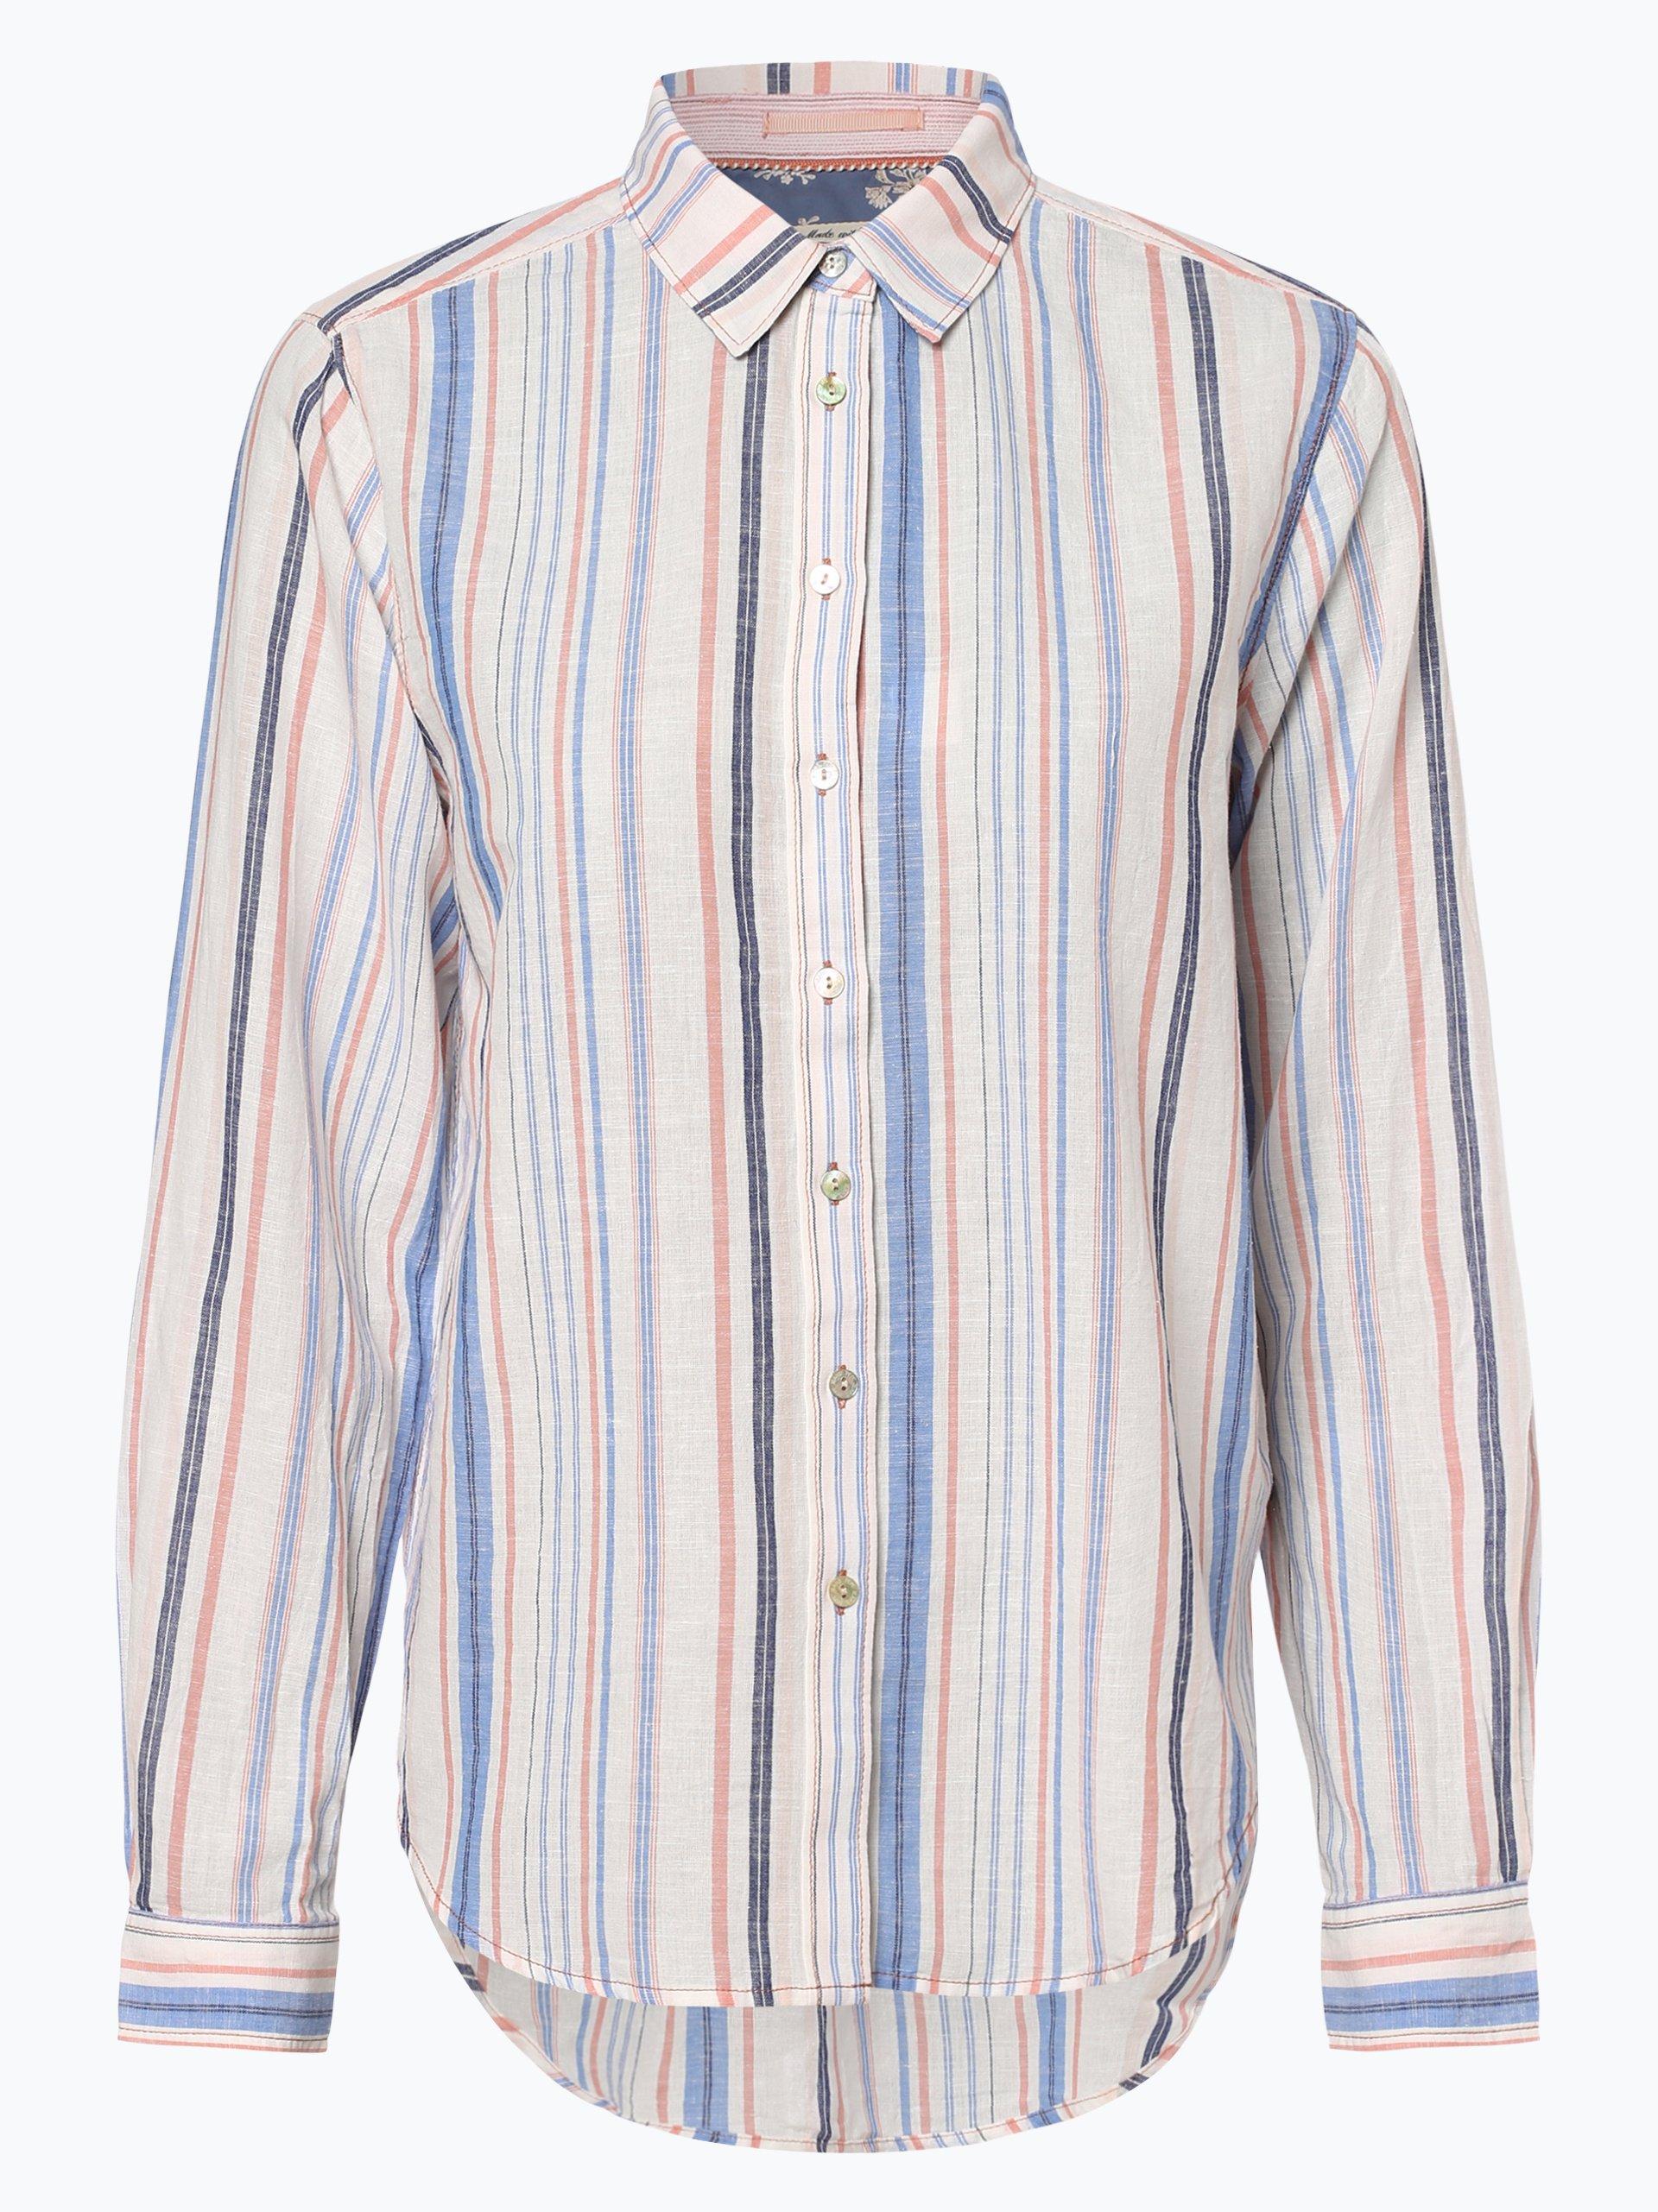 Pepe Jeans Damen Bluse mit Leinen-Anteil - Bobby